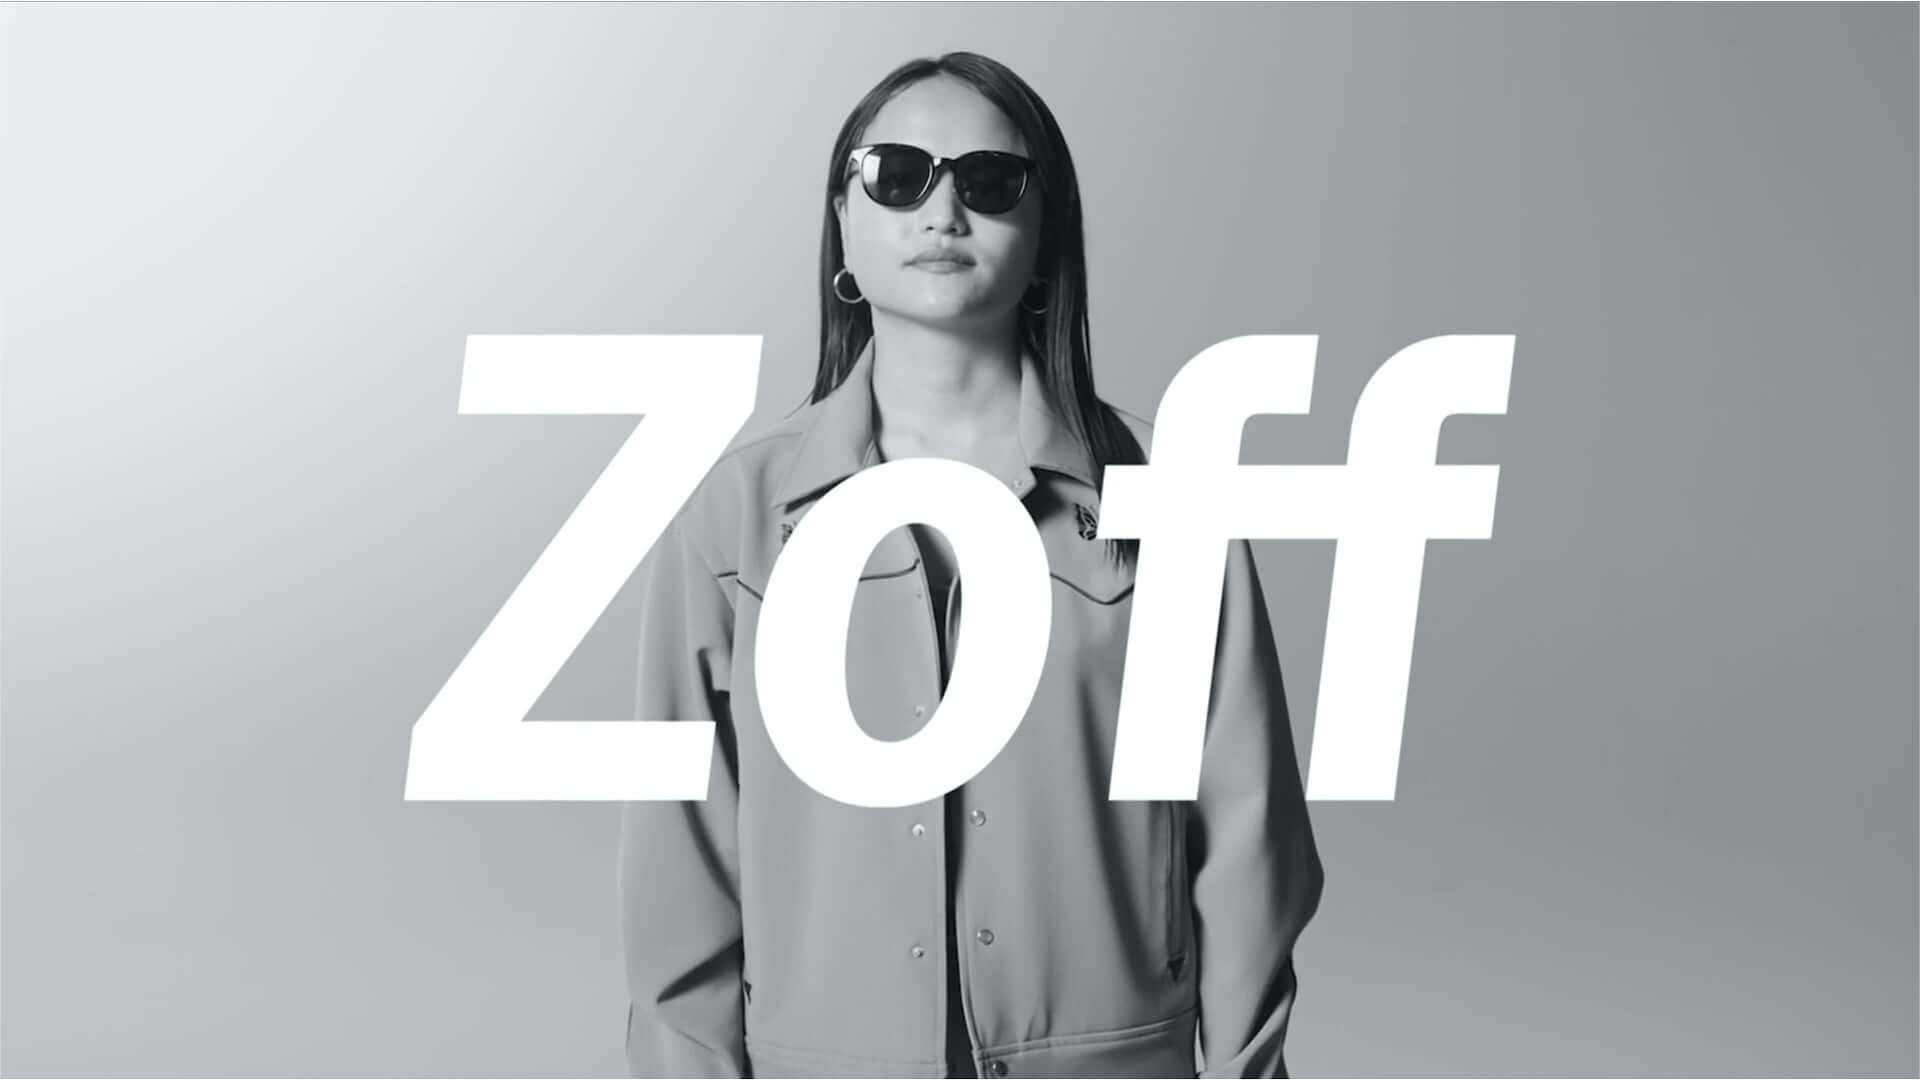 iriとLUCKY TAPESが出演!2WAYグラス『Zoff NIGHT&DAY』のムービーが公開&<Zoff Rock 2020>の開催も決定 music200324_zoff_movie_4-1920x1081